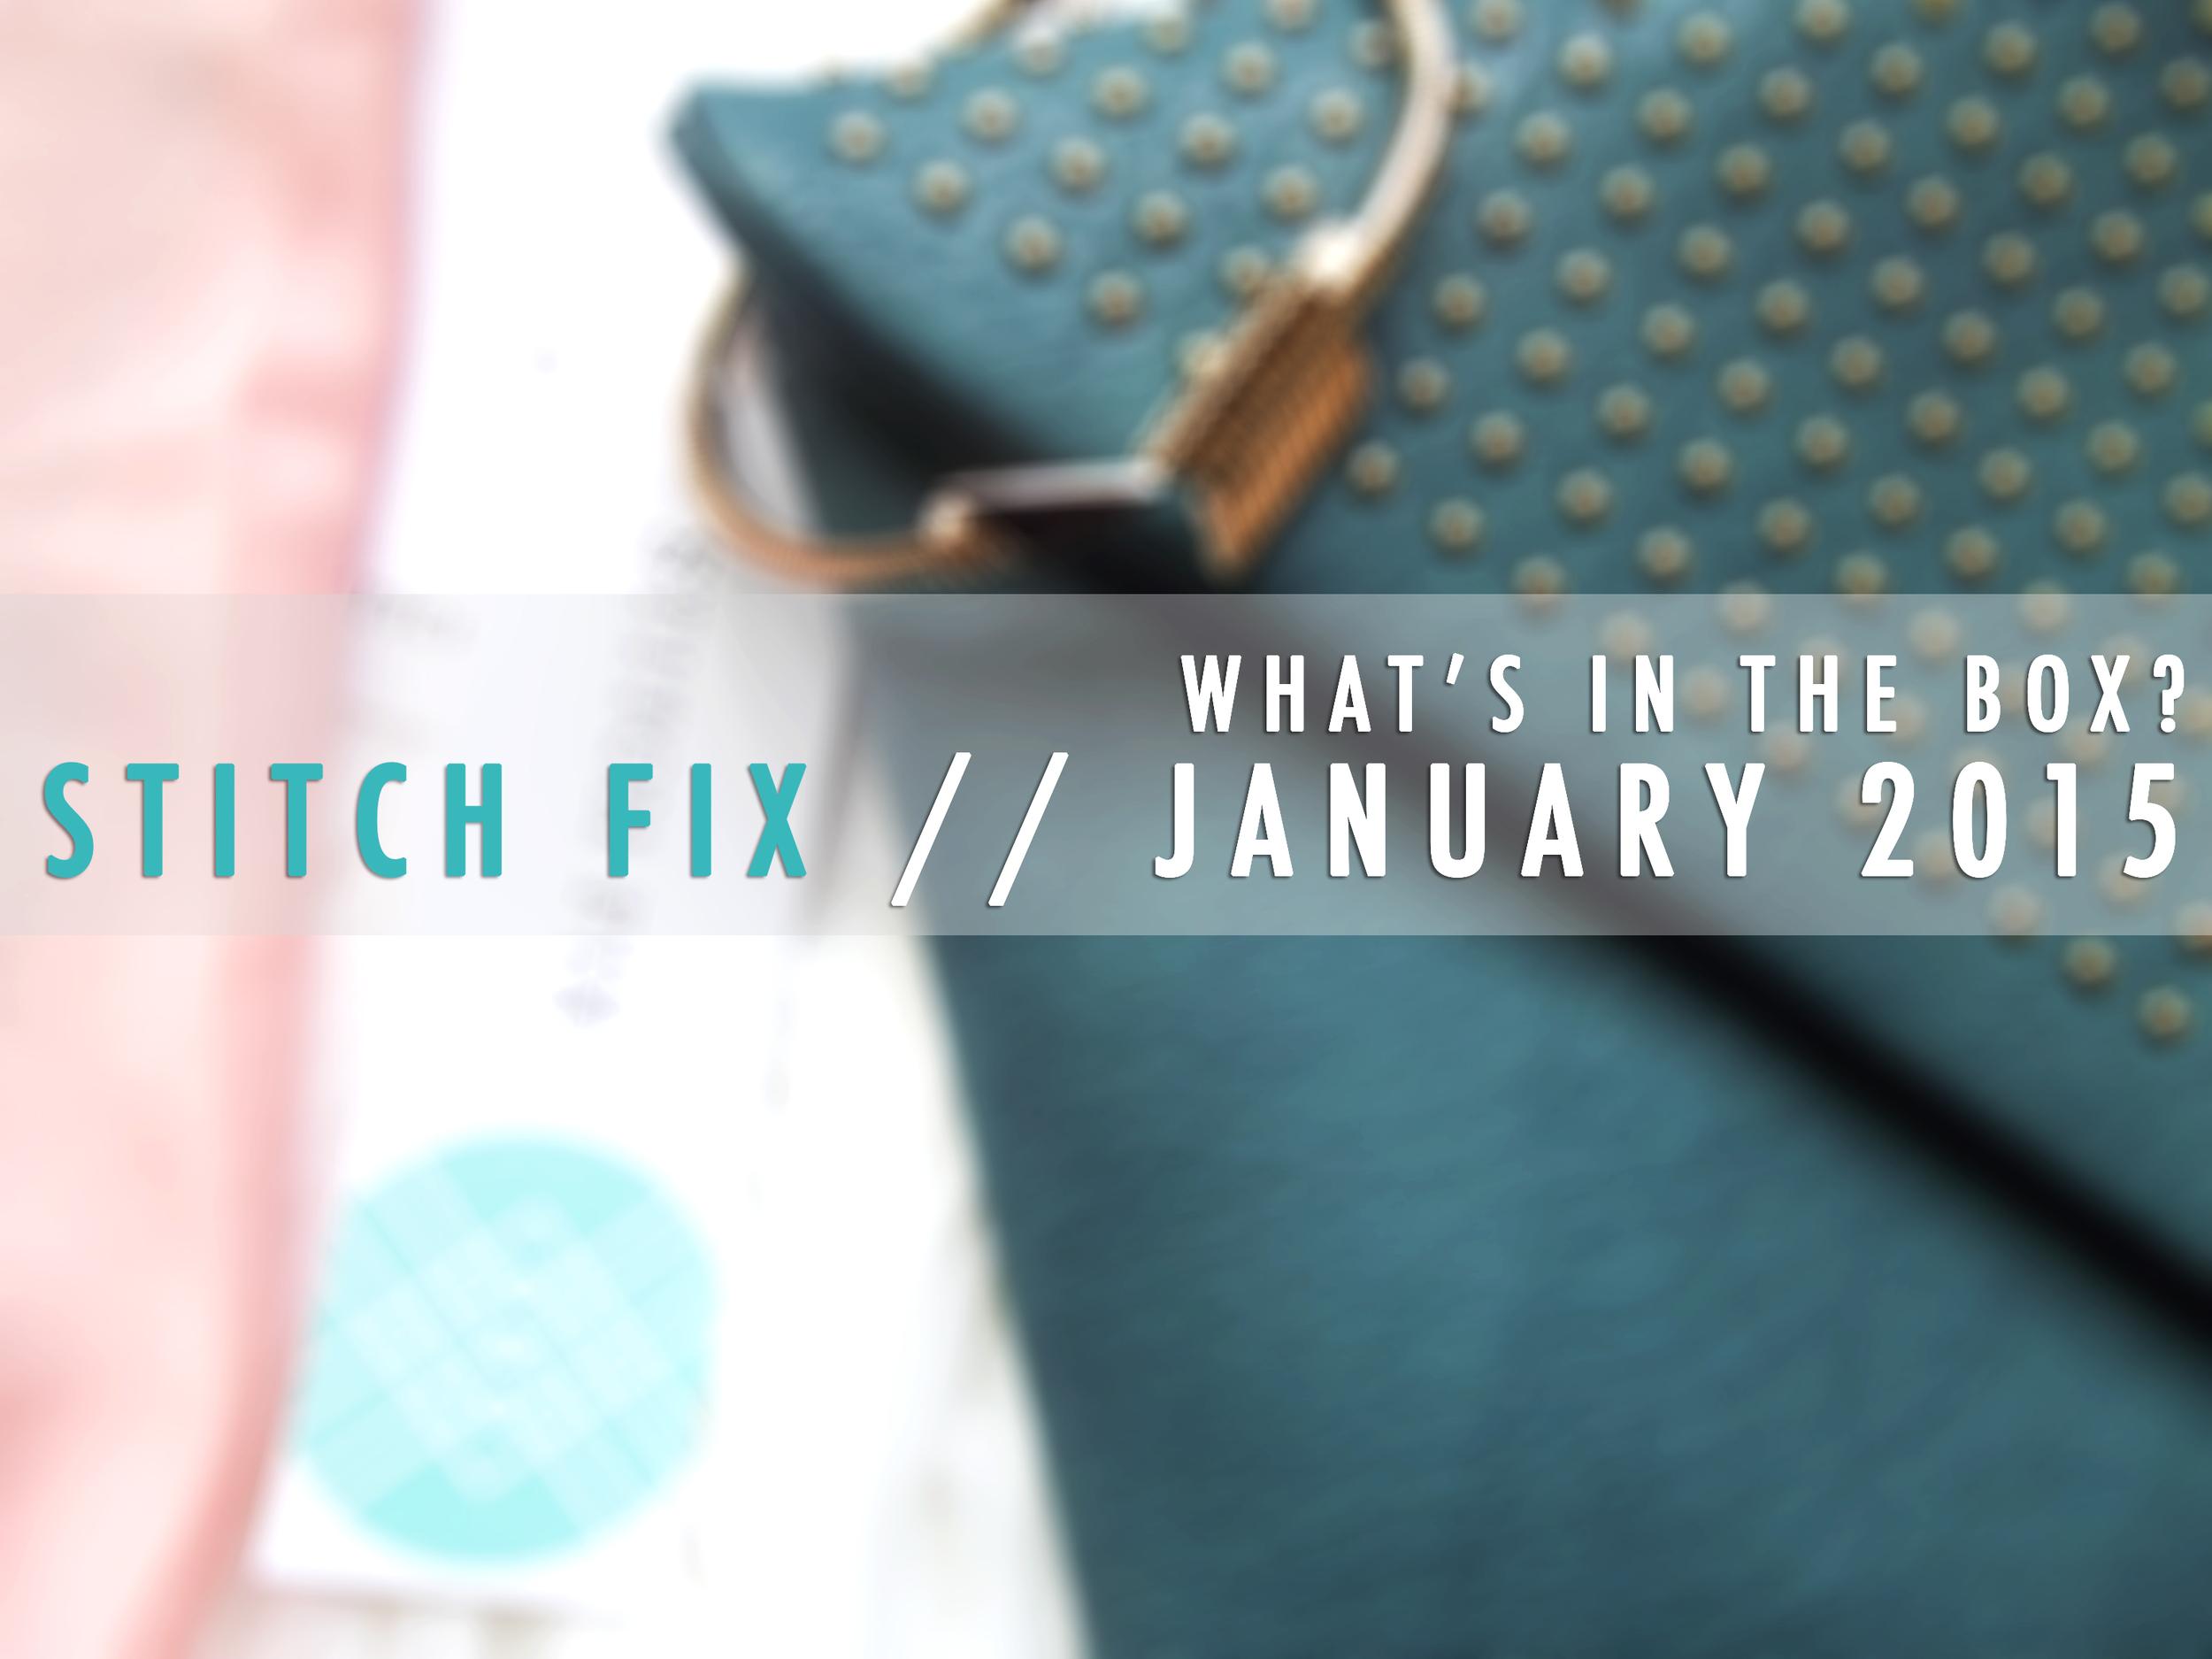 stitch-fix-january-2015-header